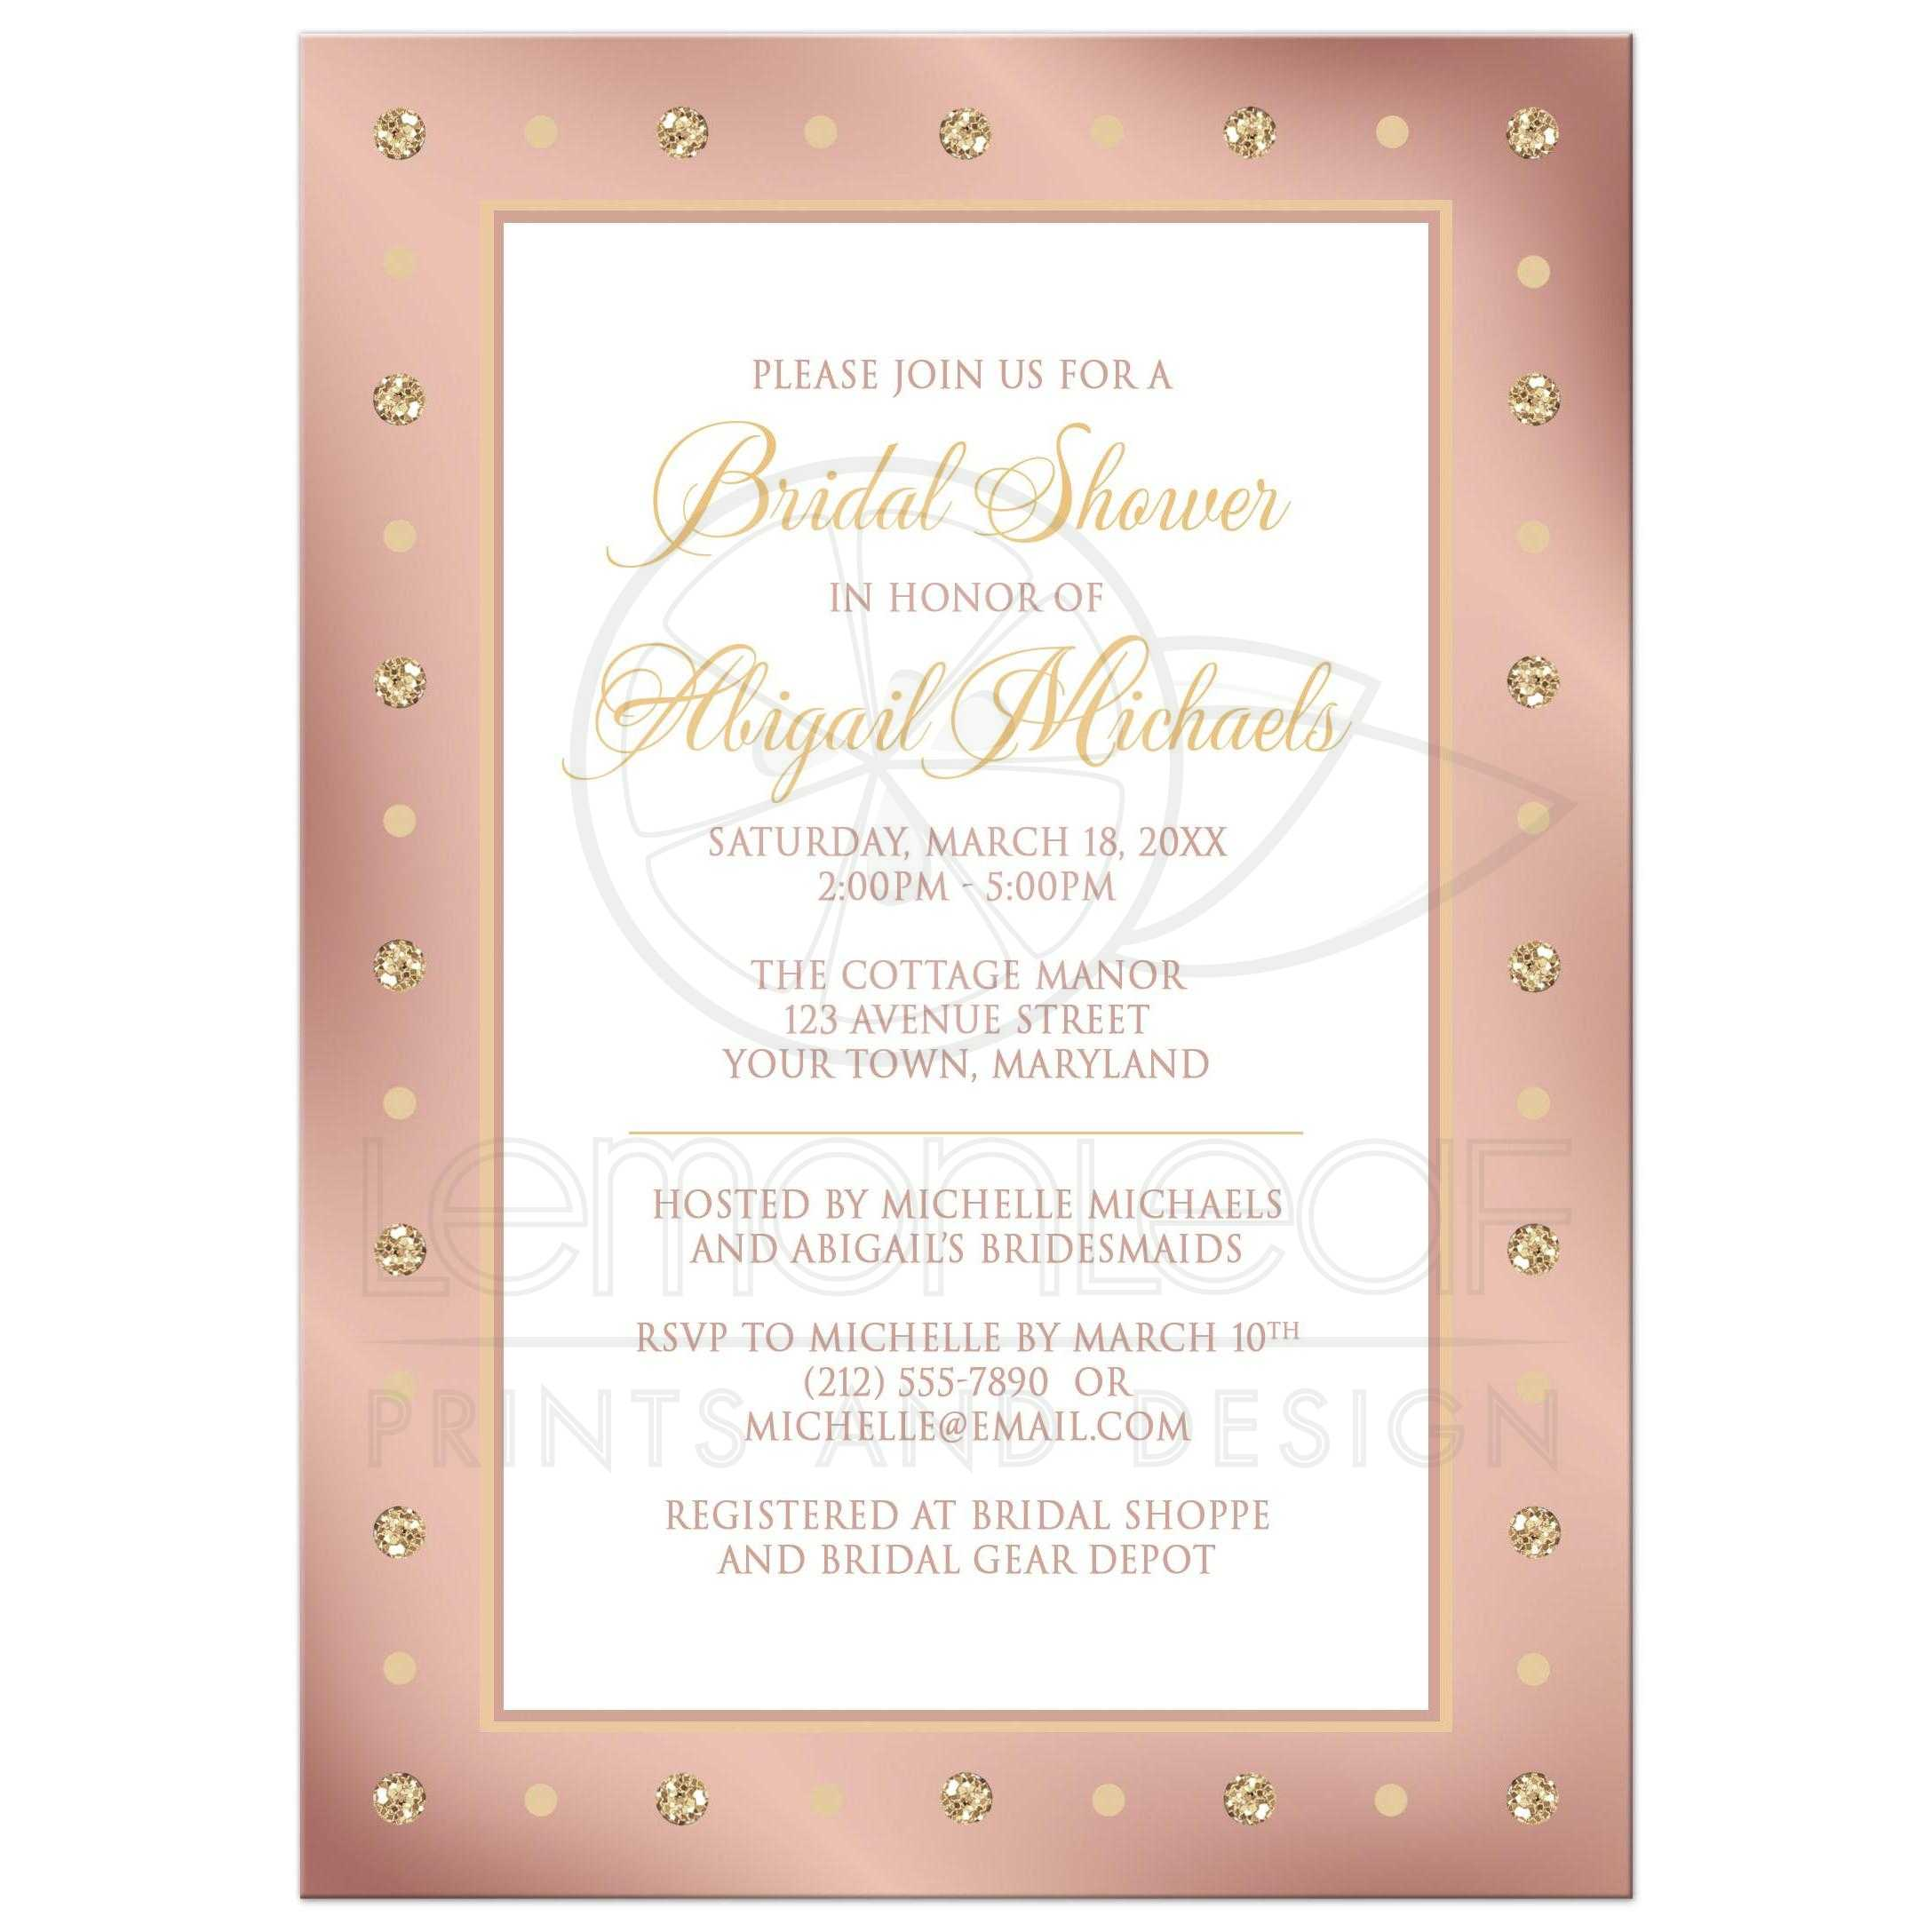 Bridal Shower Invitations Elegant Border Rose Gold